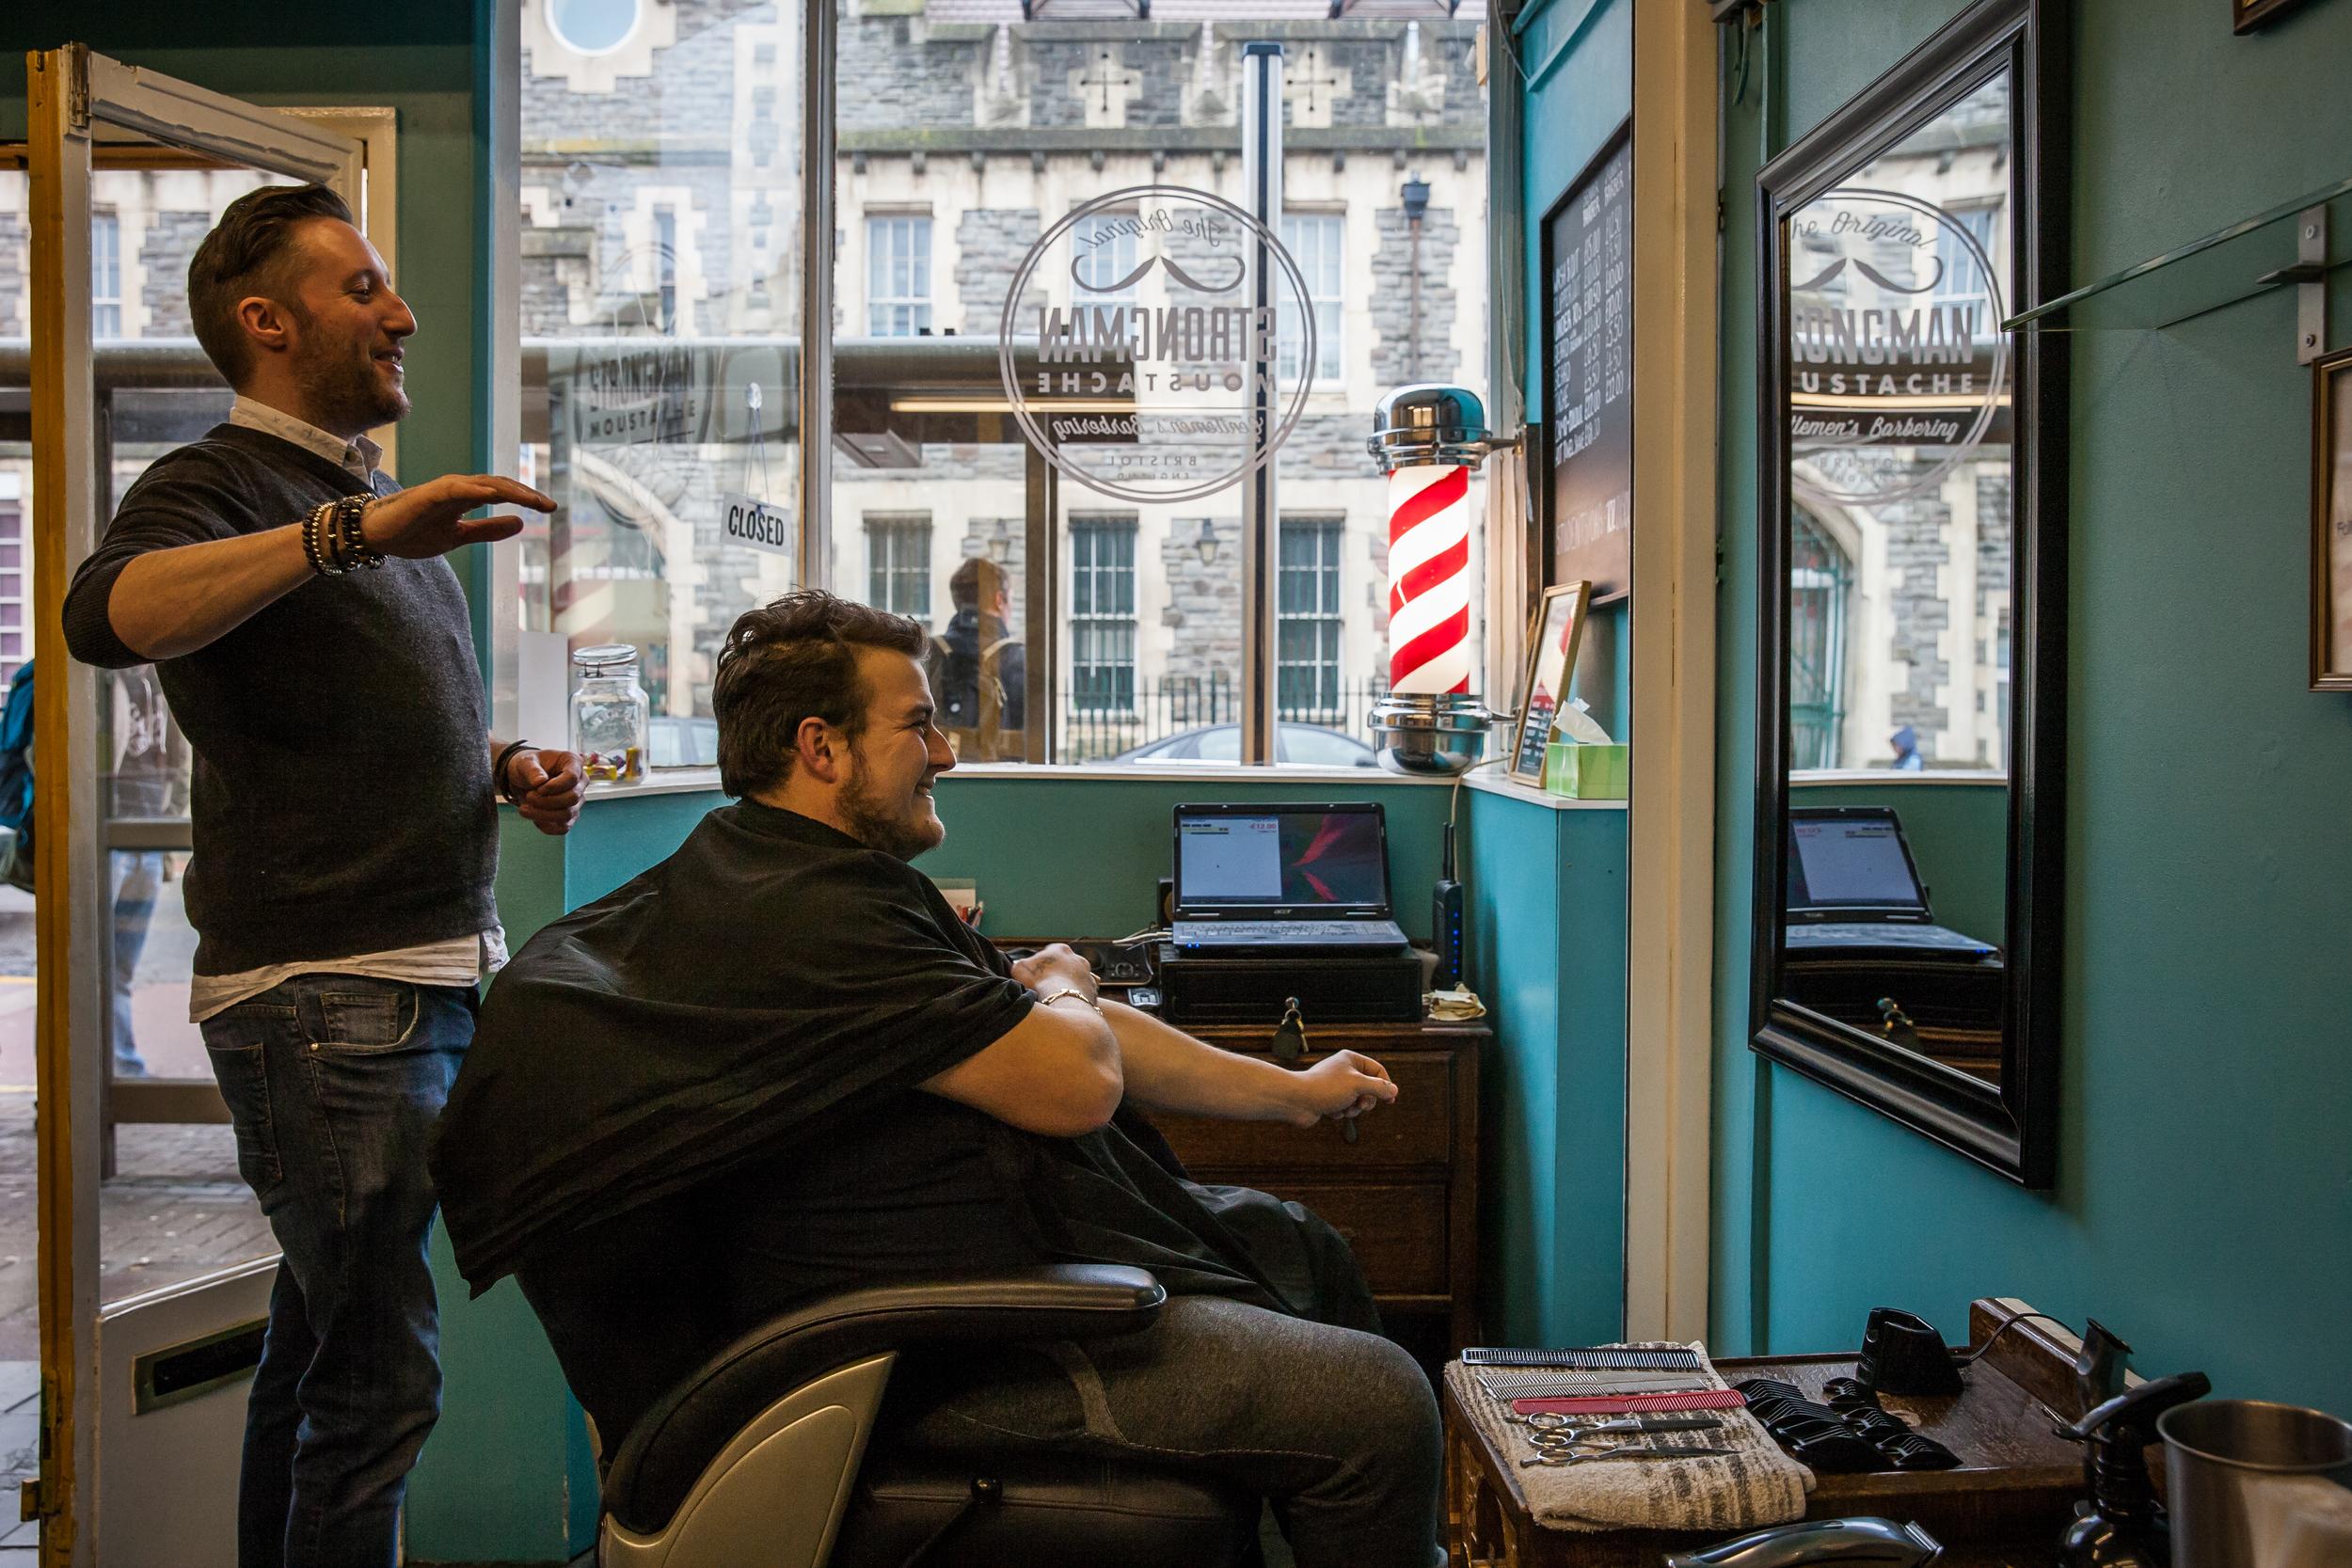 Strongman Moustache, Bedminster,Barber Shop Photo Essay for   Bristol 24/7 Magazine .